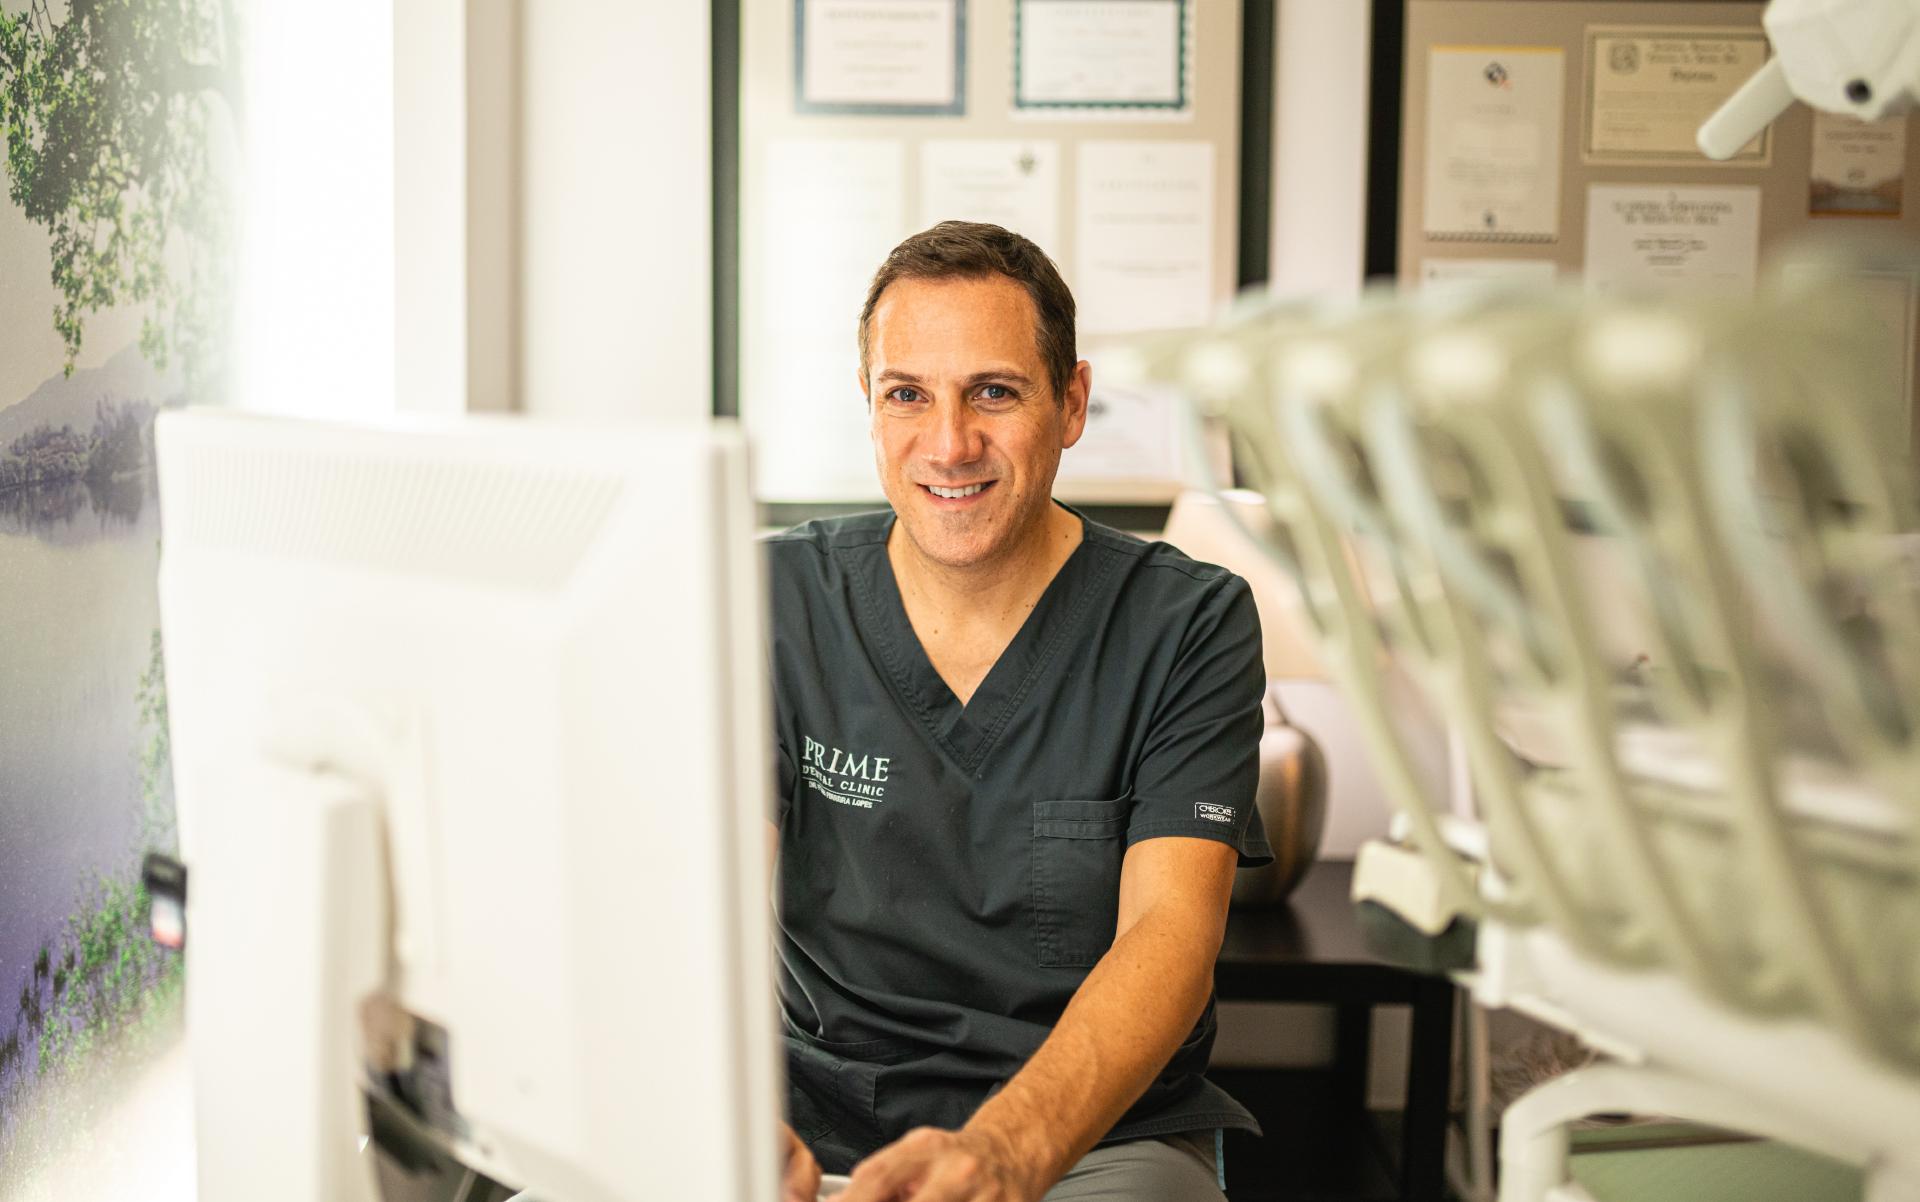 Dr. Pedro Ferreira Lopes